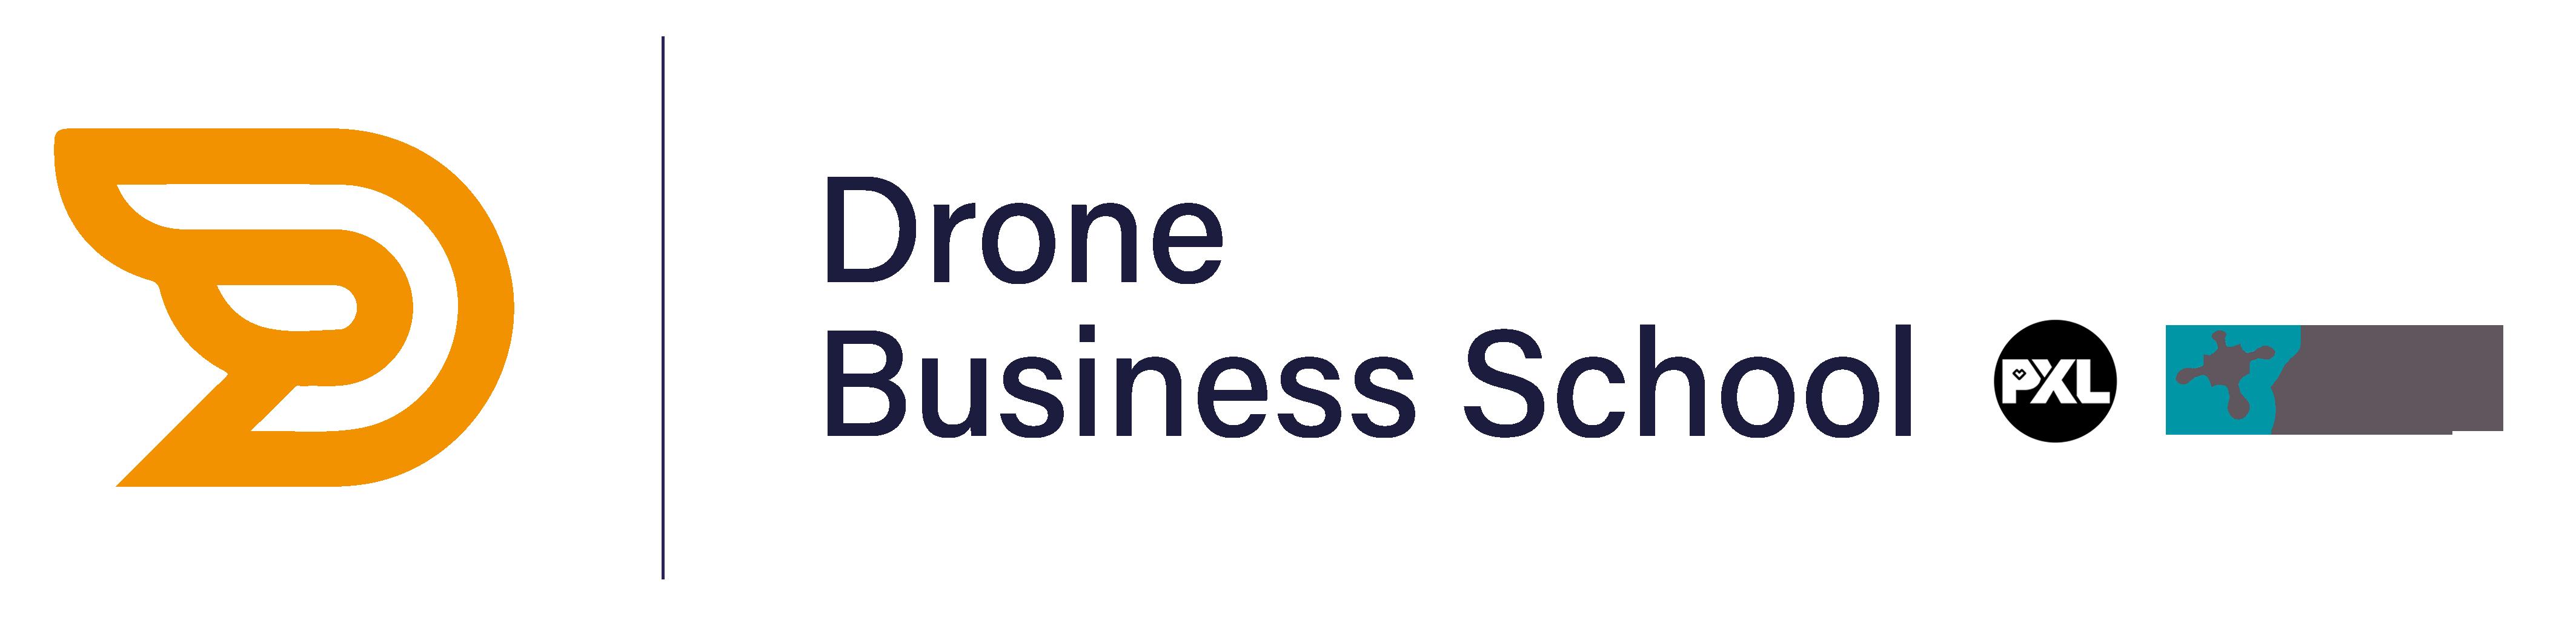 Drone Business School